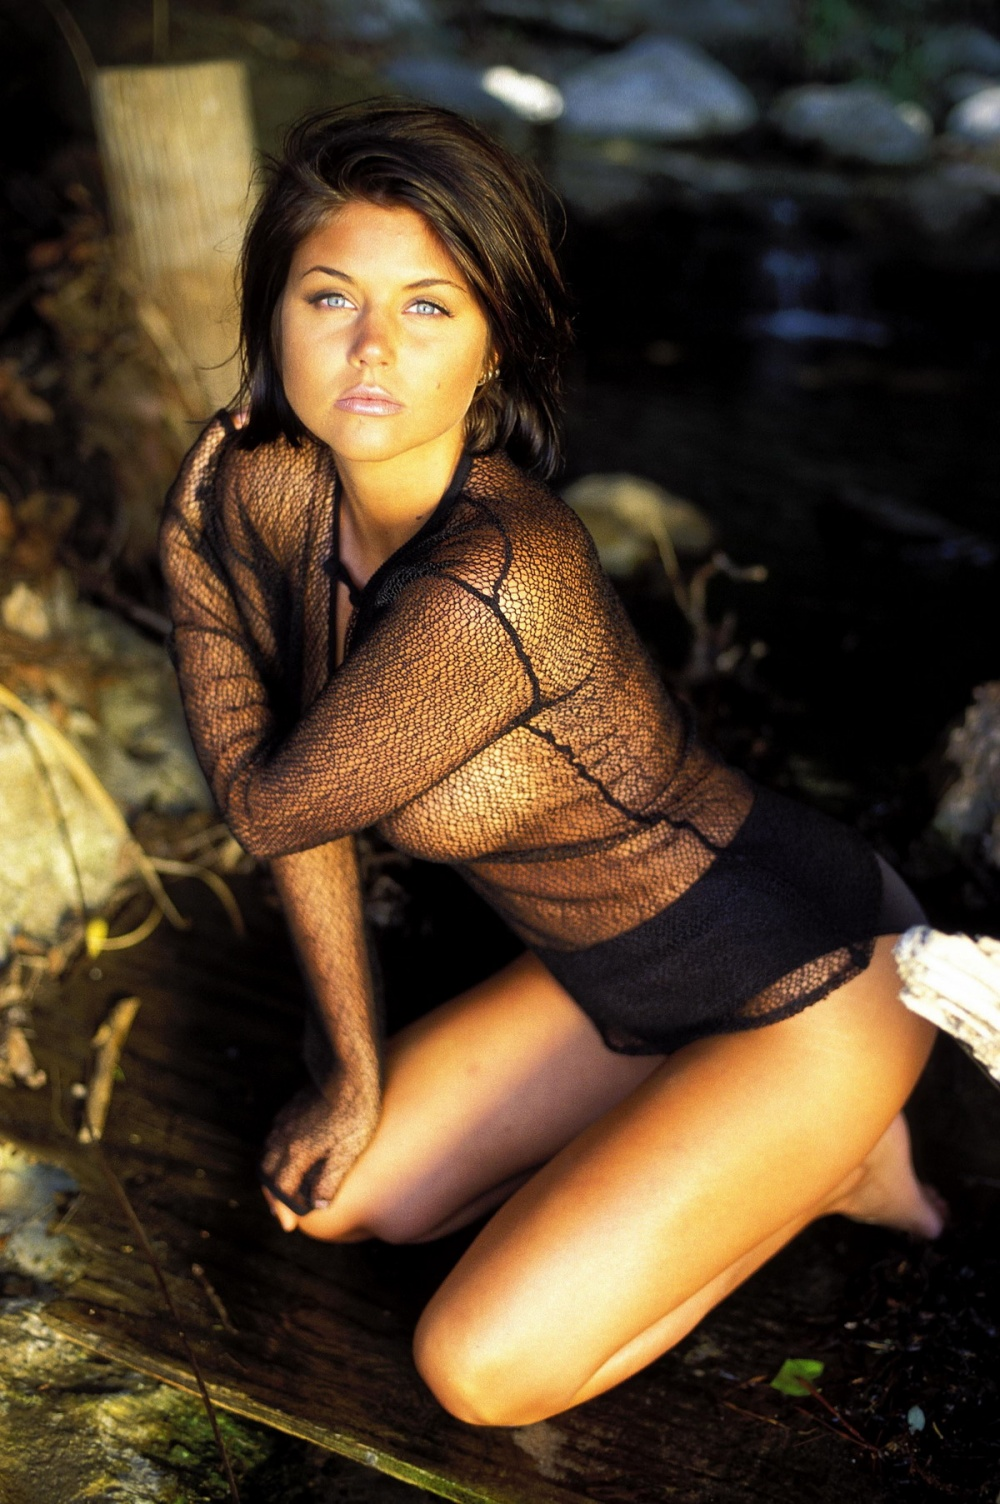 Tiffani-Amber Thiessen